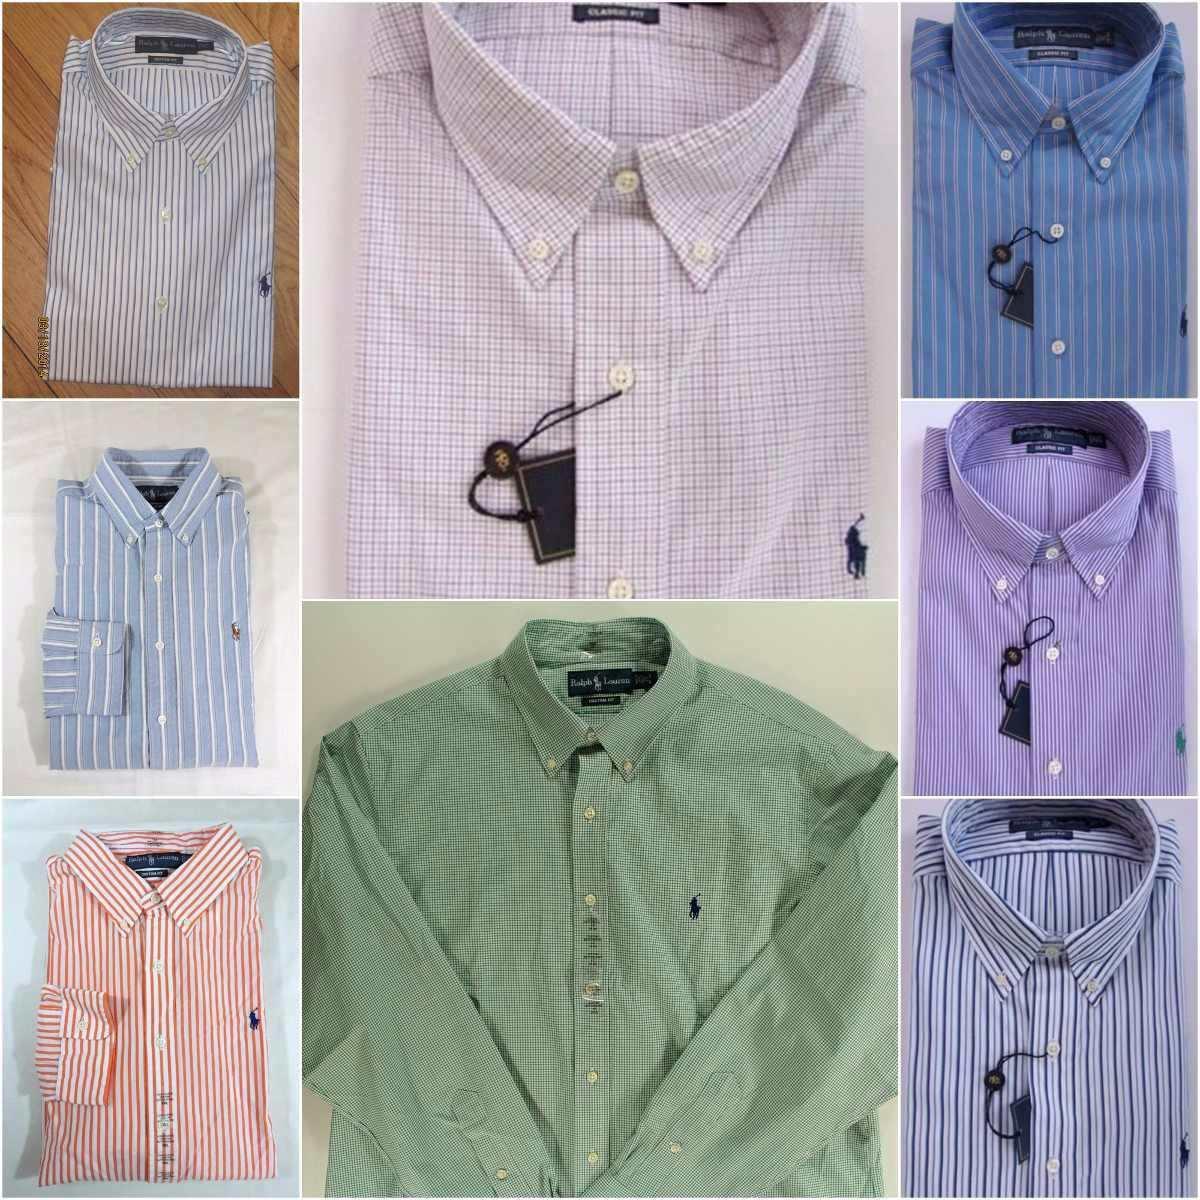 Camisas Polo Ralph Lauren De Hombre Por Encargue!! - U S 79 2a774ffa9c177